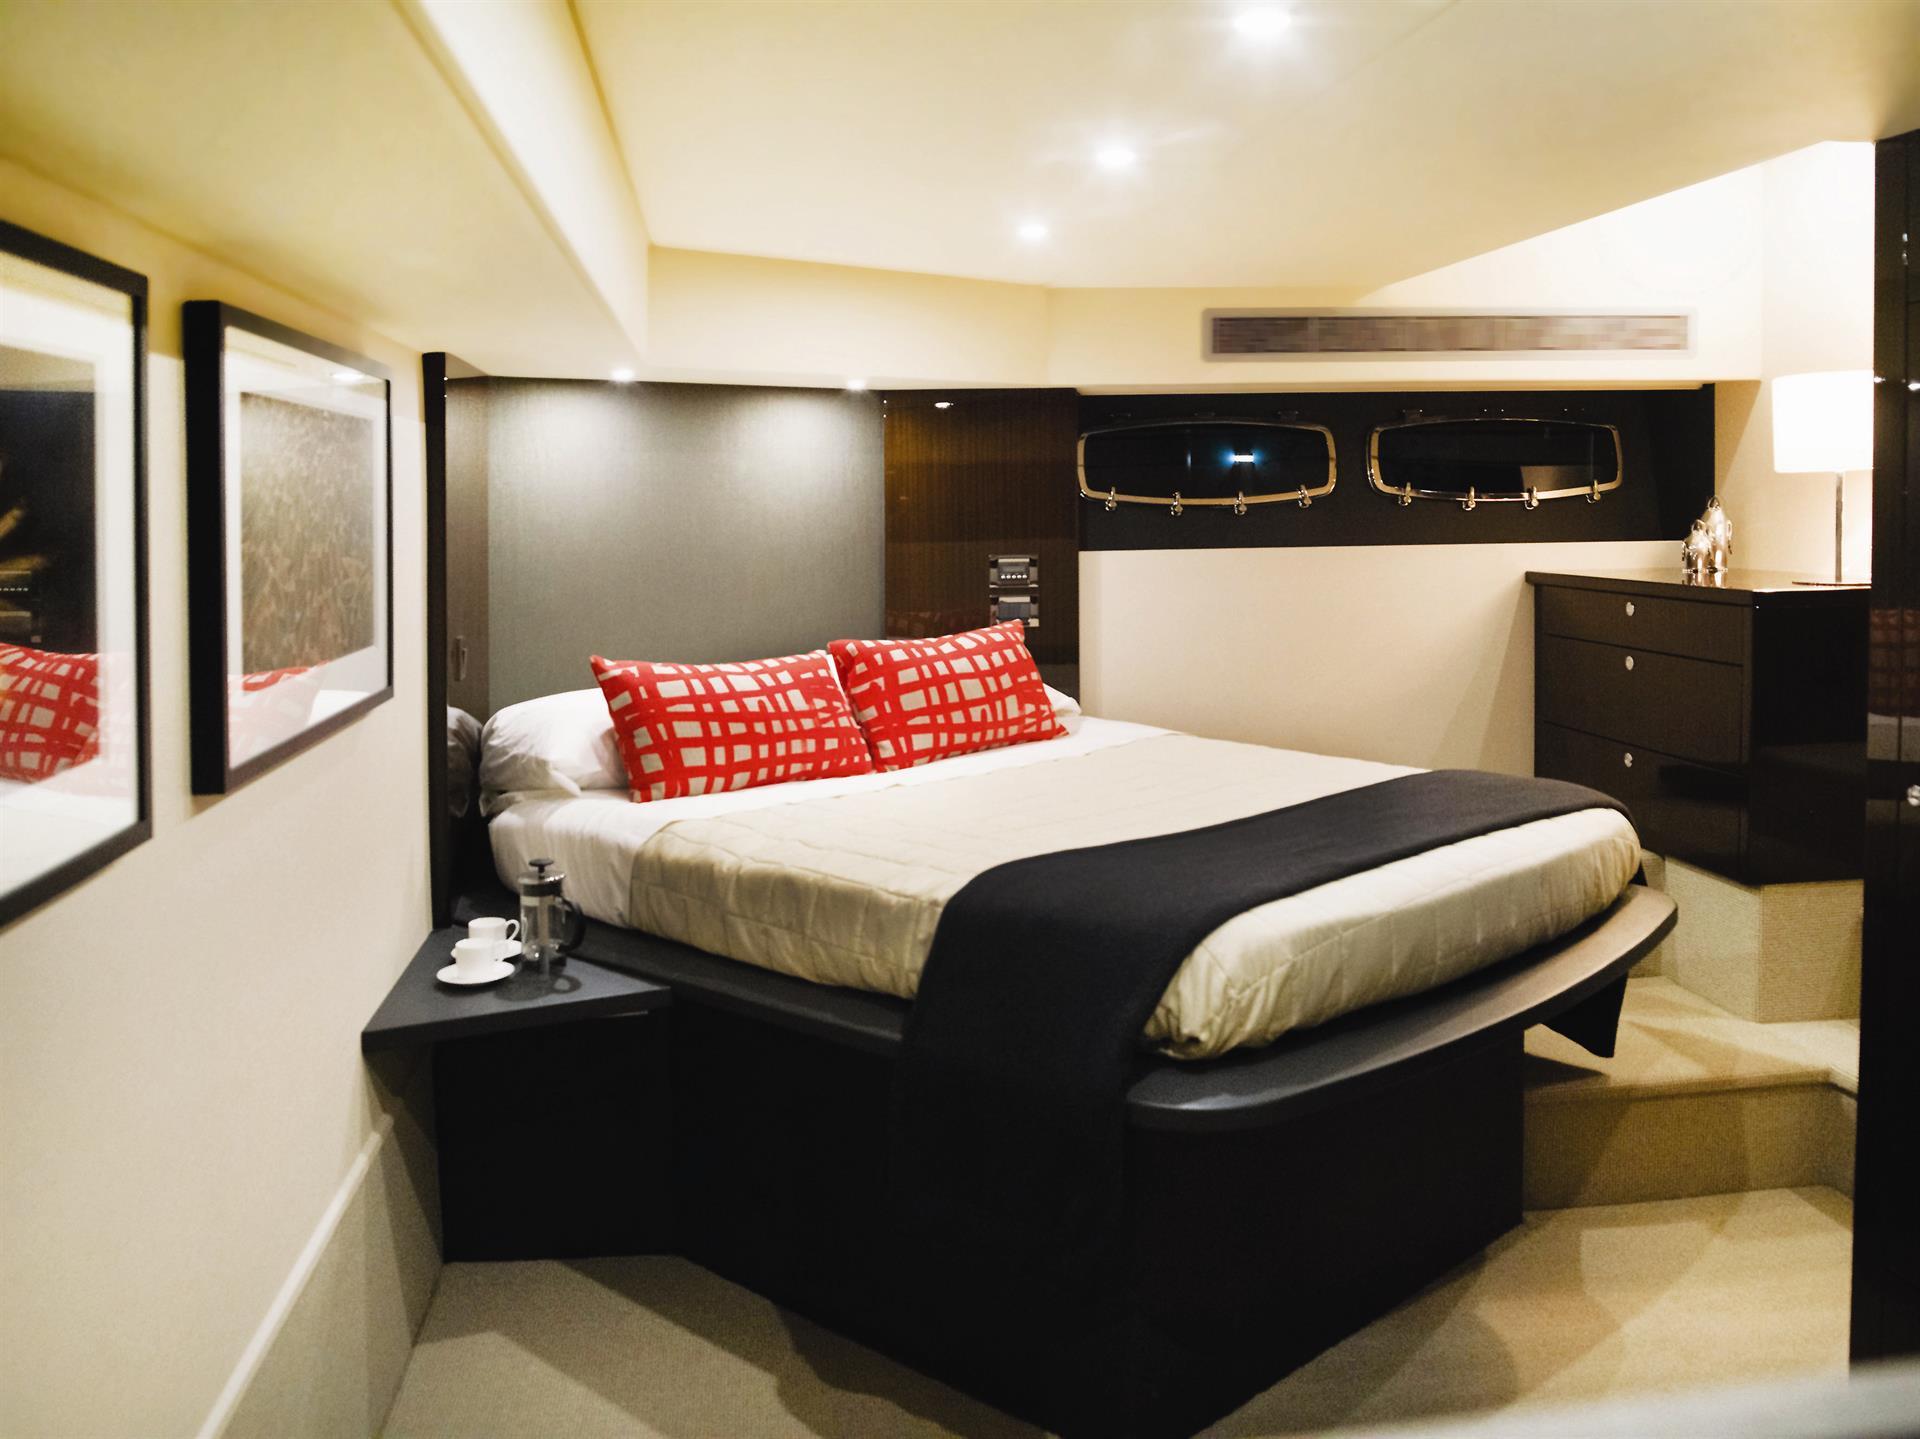 Maritimo S51 Bedroom